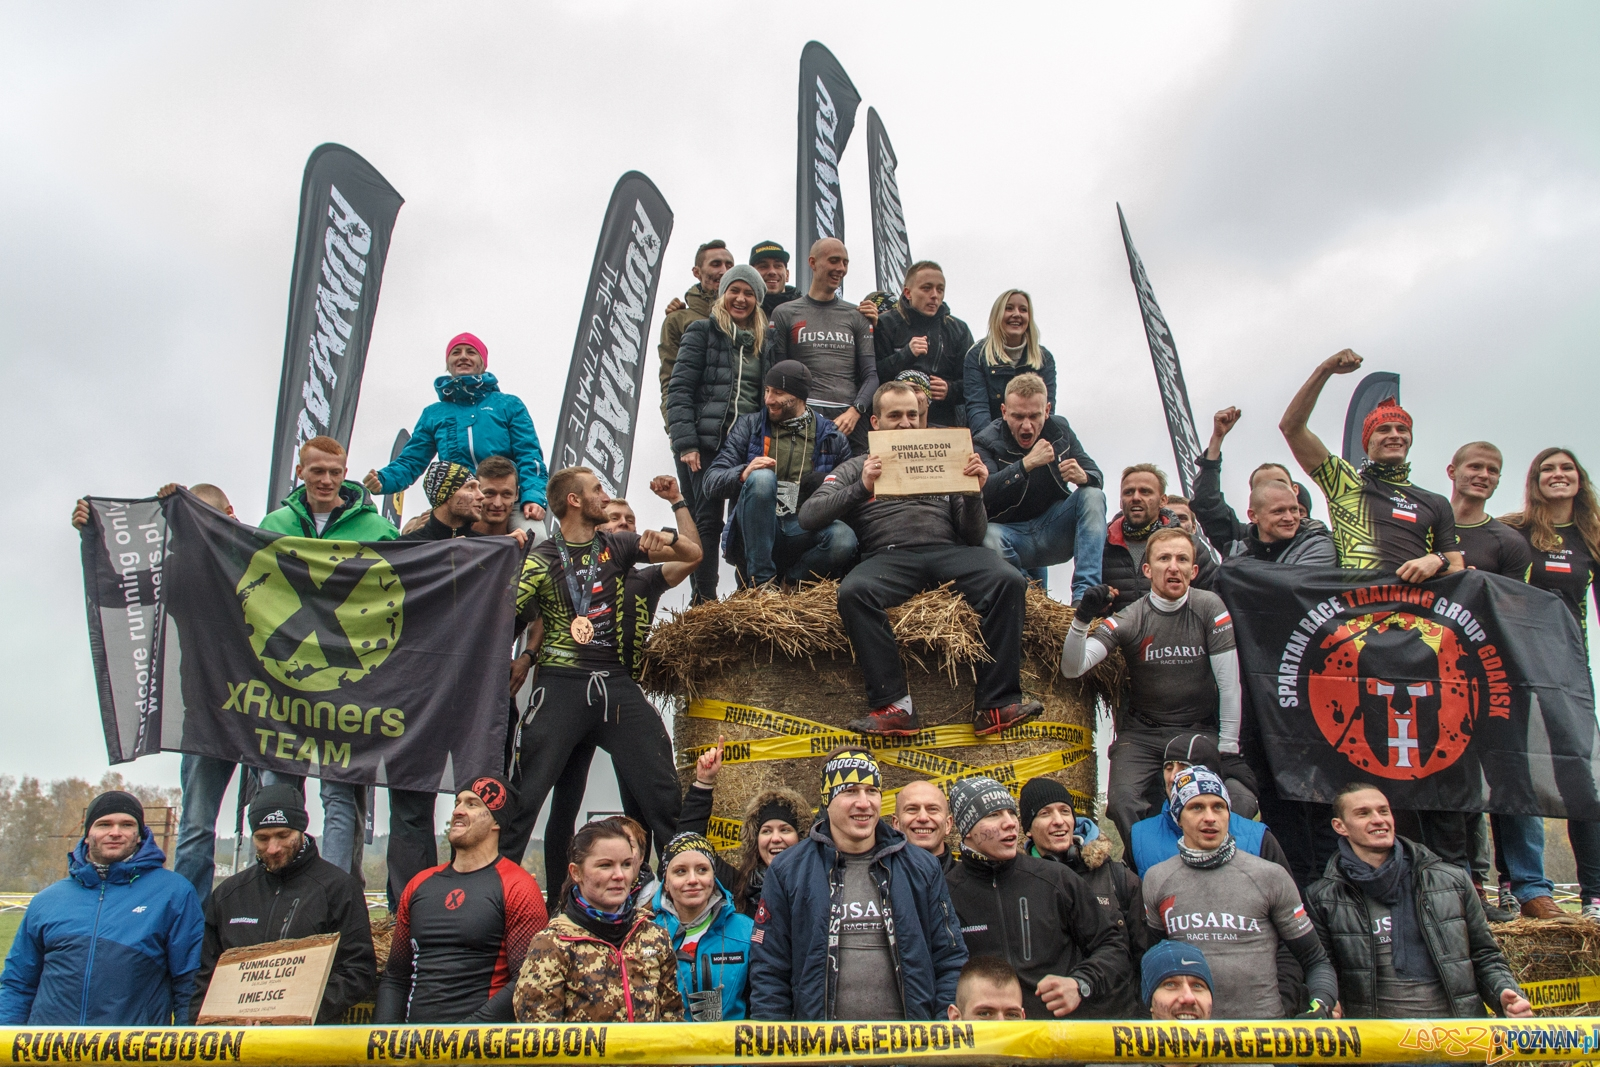 Runmageddon 2016 - Poznań 6.11.2016 r.  Foto: LepszyPOZNAN.pl / Paweł Rychter